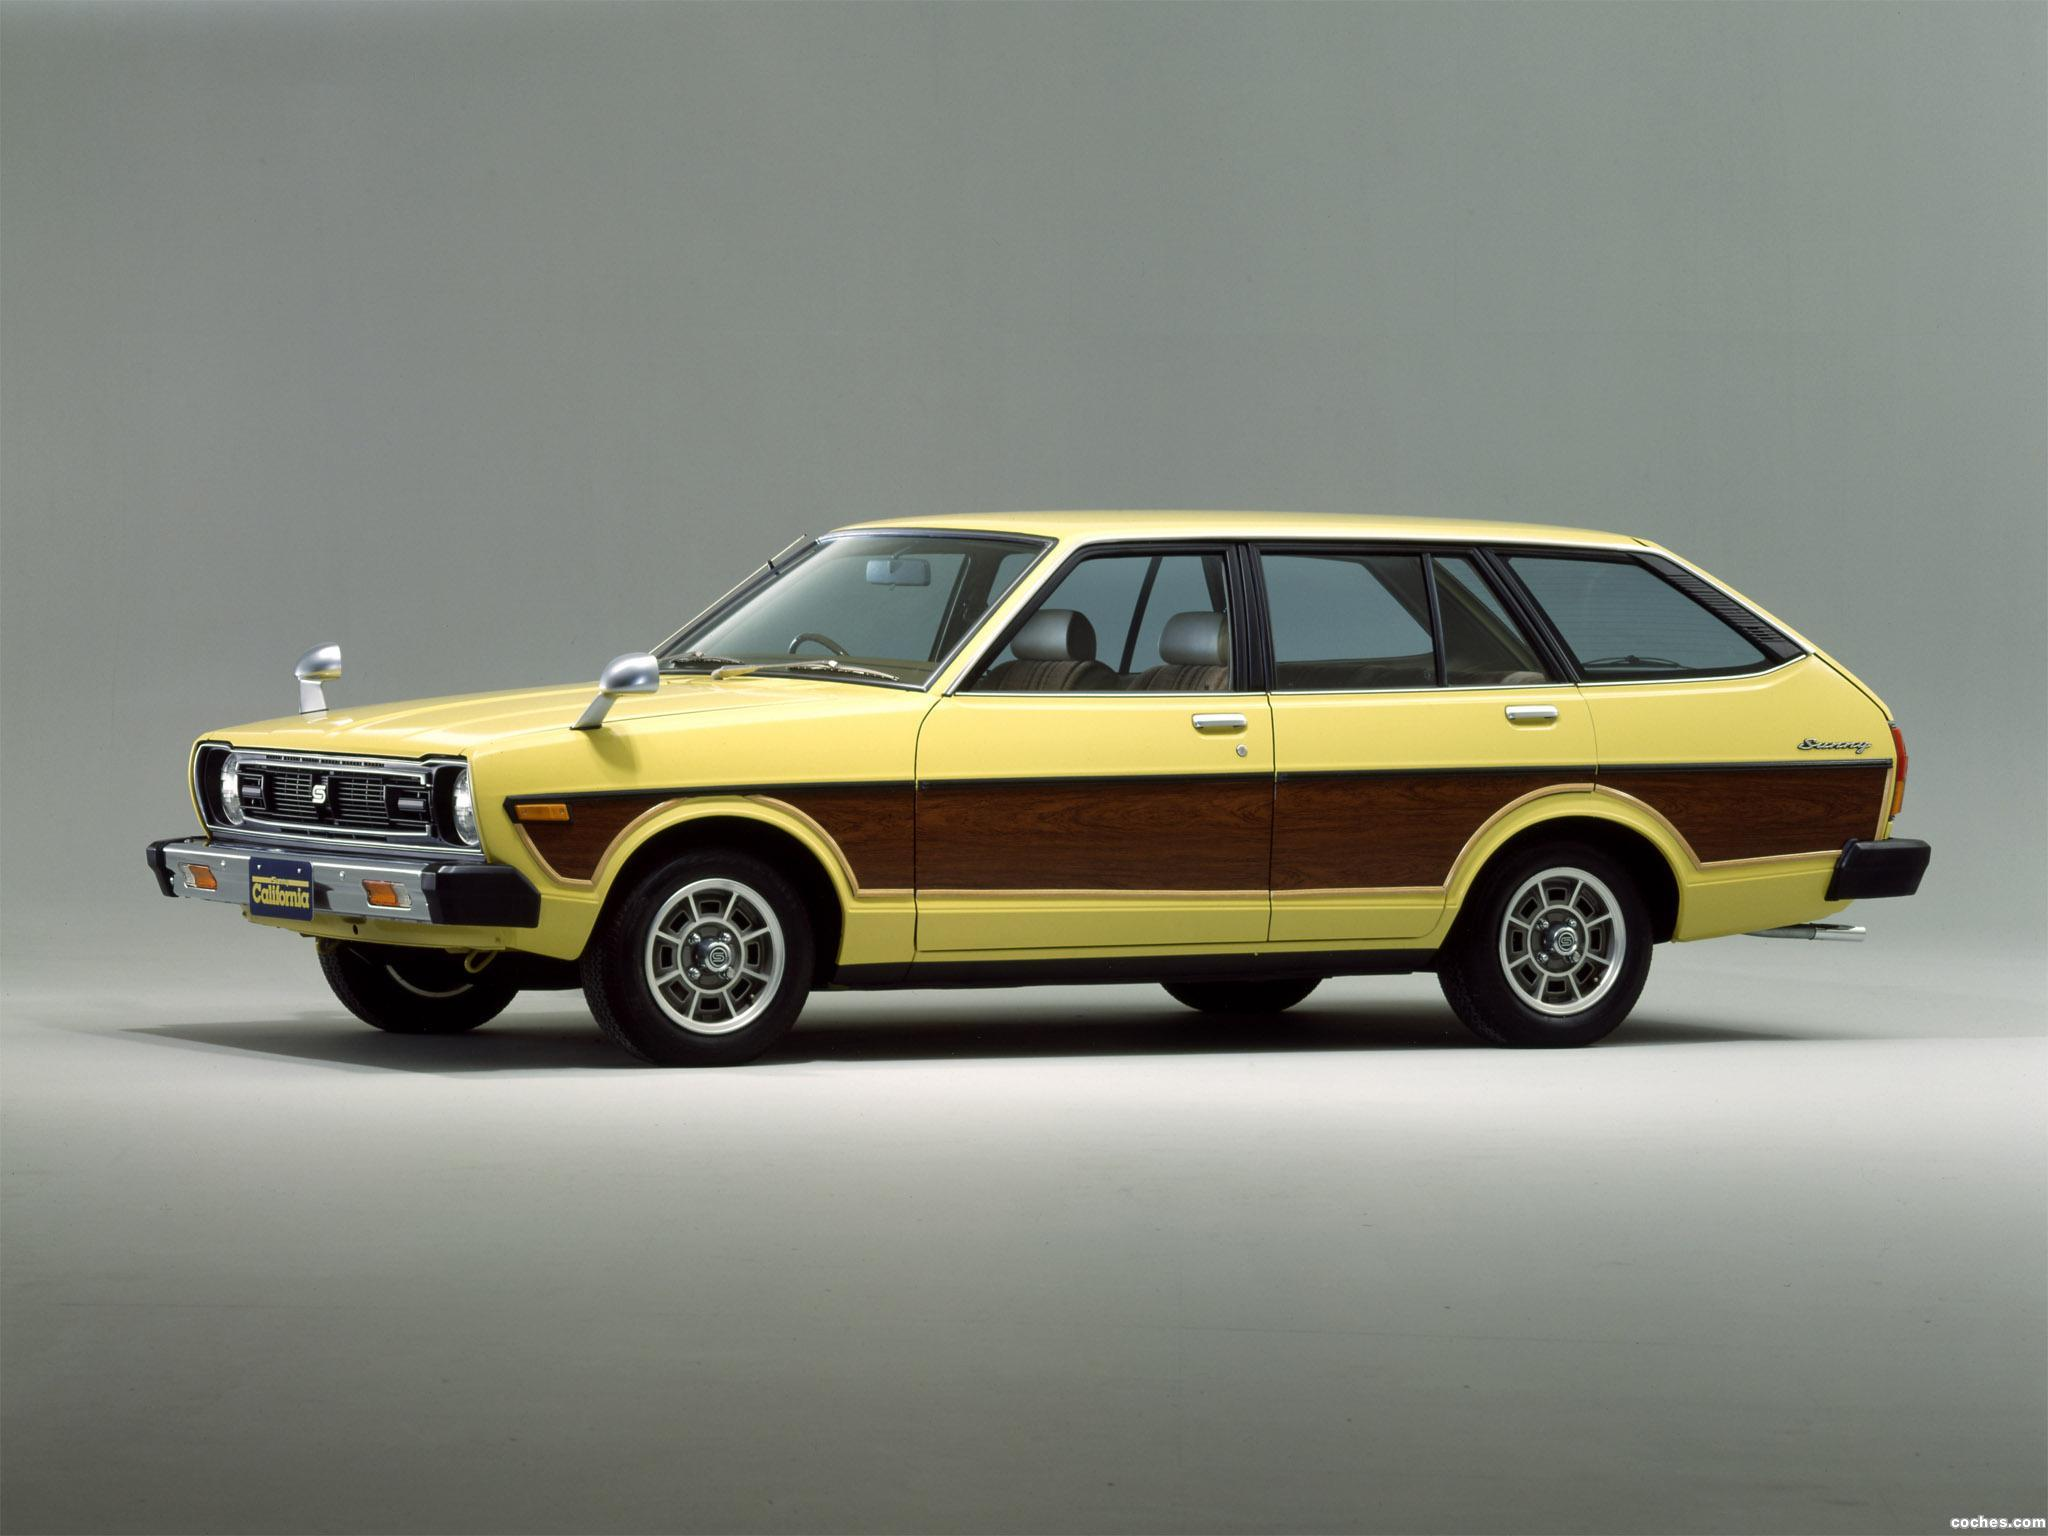 Foto 0 de Nissan Sunny California B310 1979